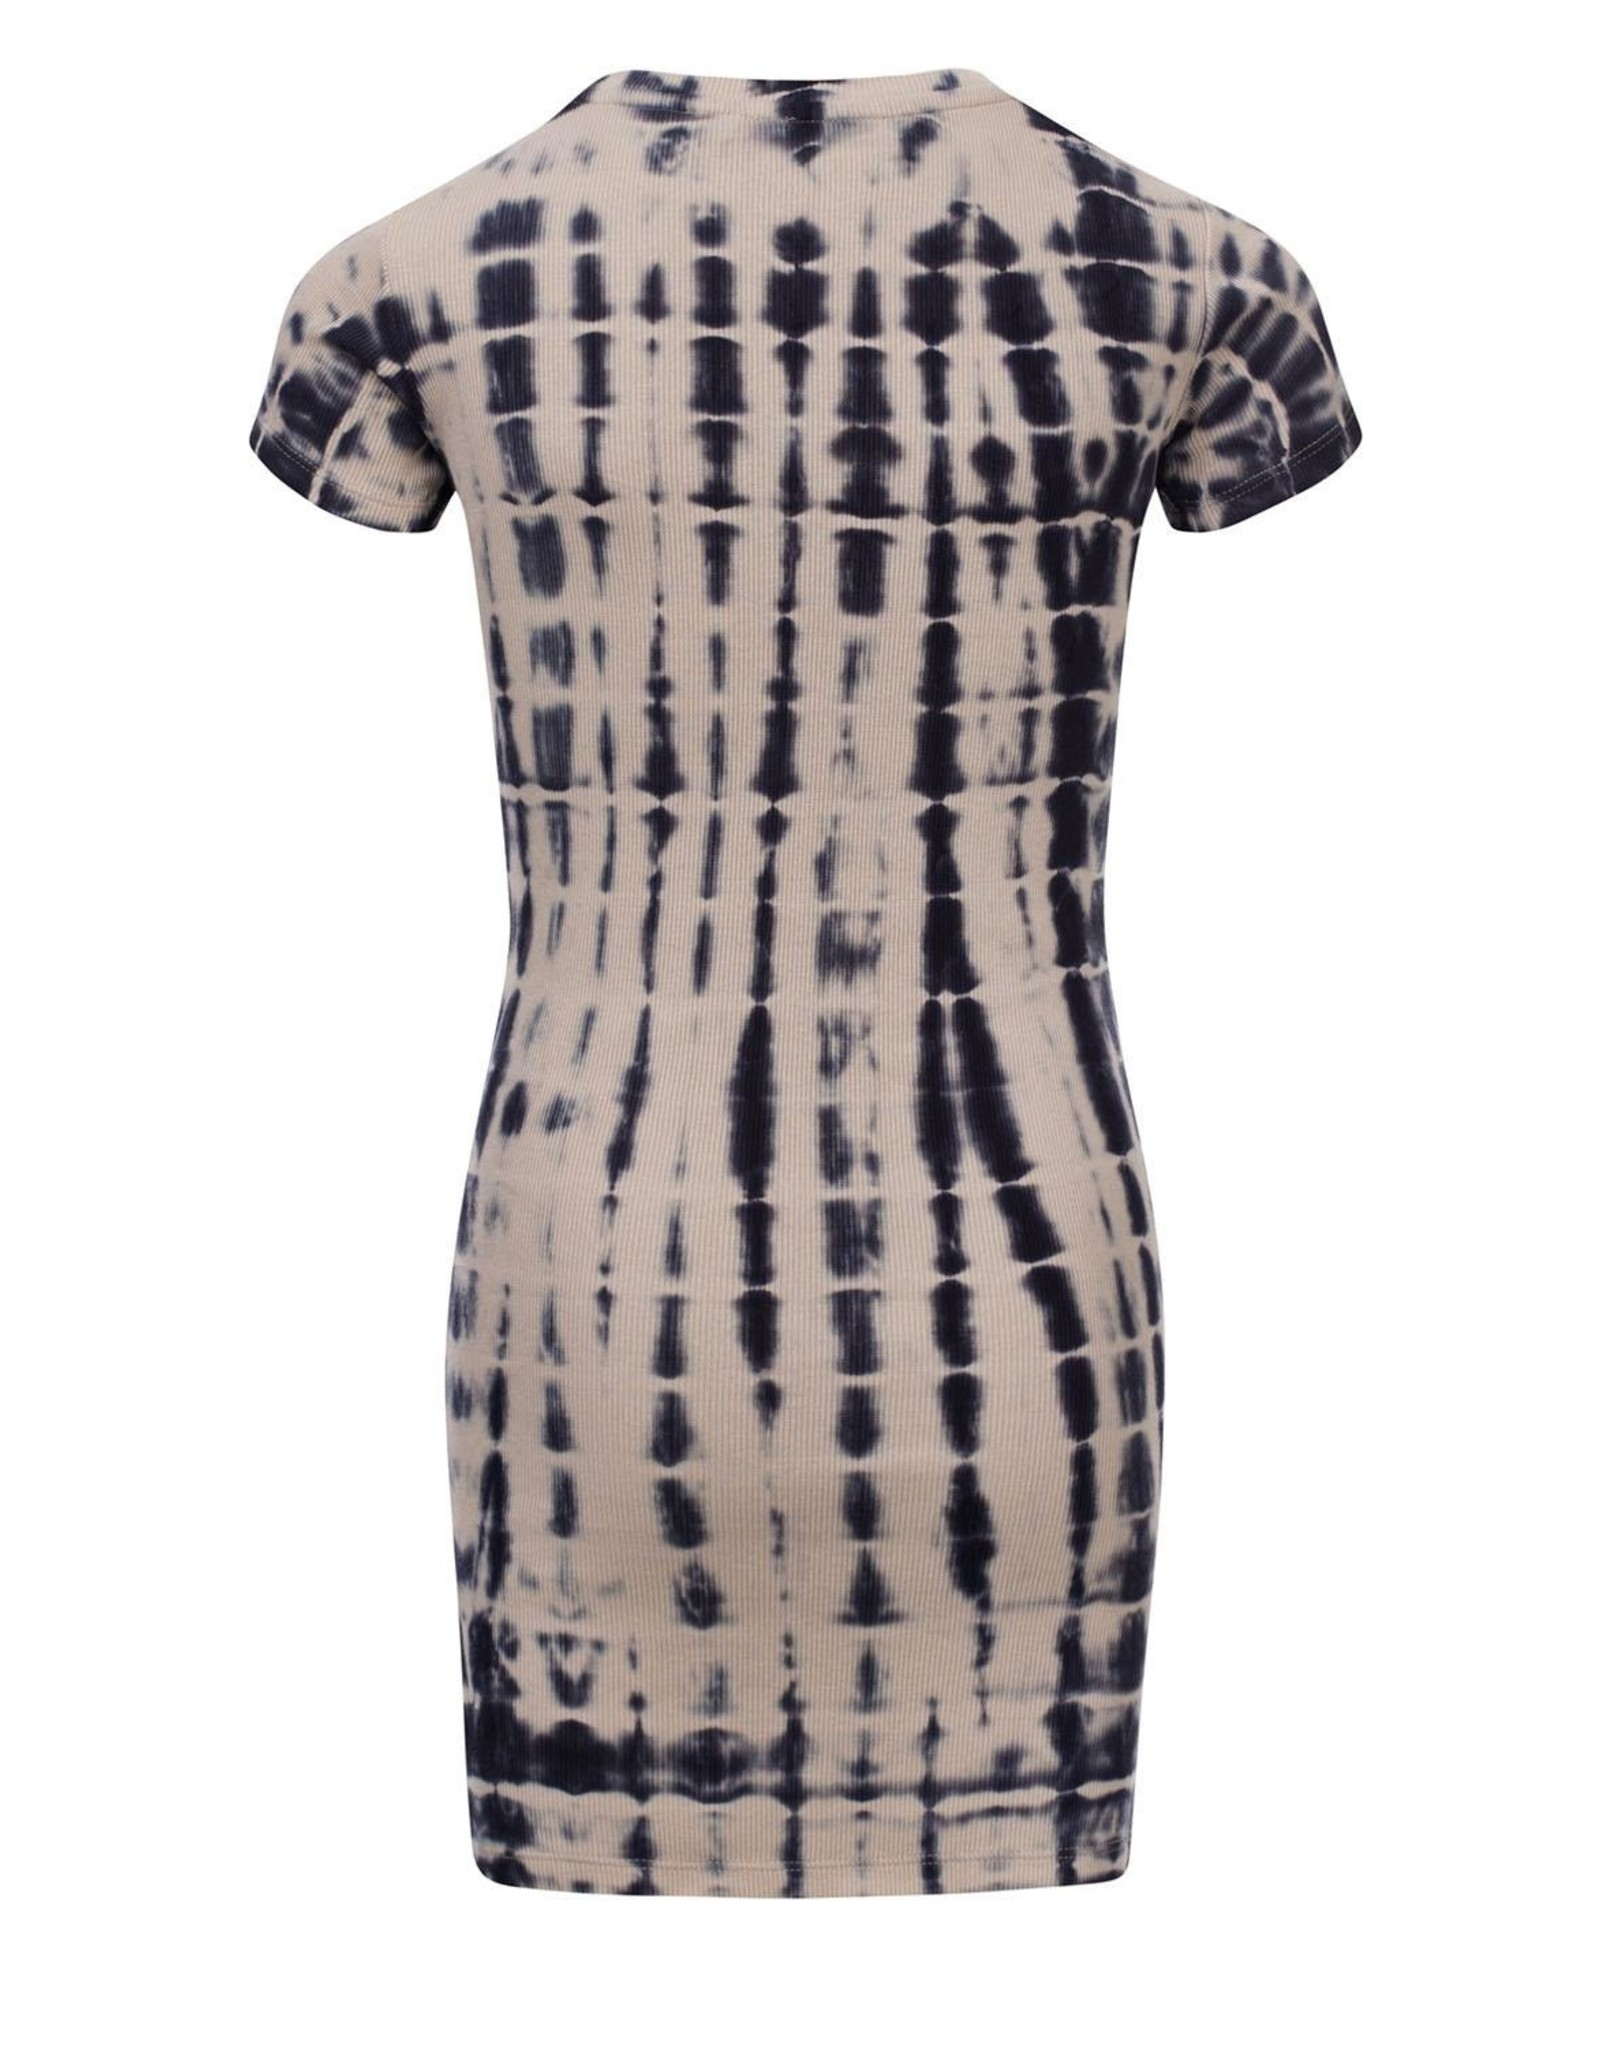 Looxs 10SIXTEEN 10Sixteen Rib Tie Dye Dress